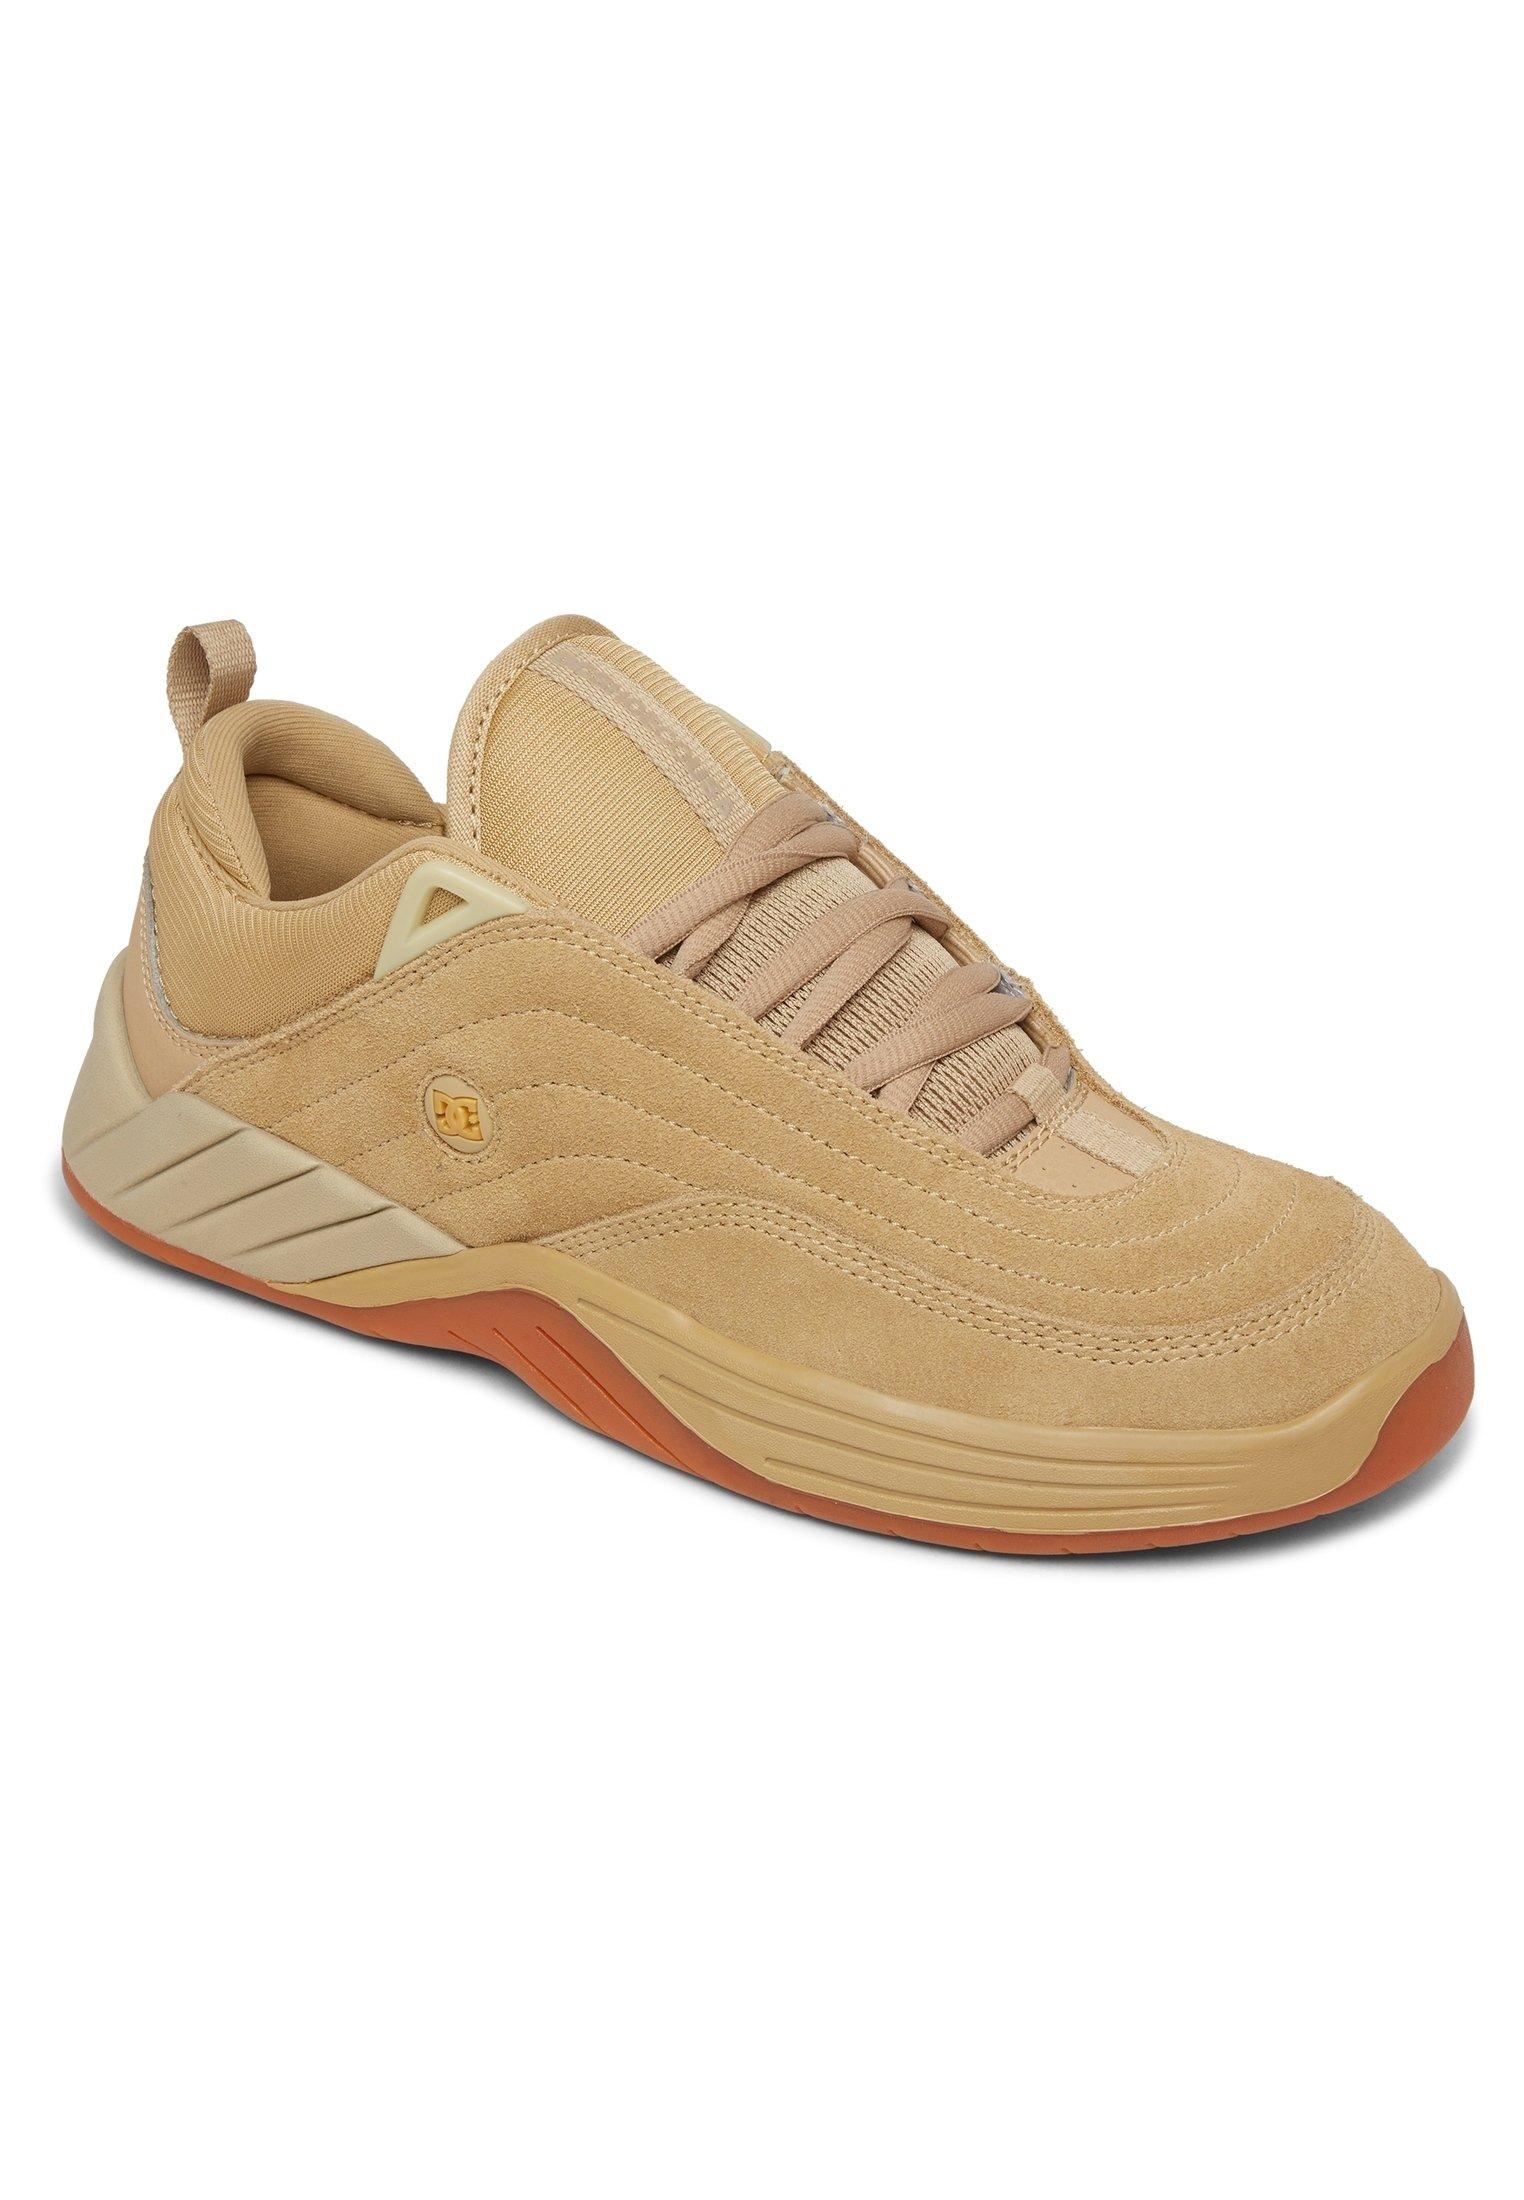 DC Shoes Williams - Skateschuh - brown/gum/braun - Herrenschuhe 1YmZW